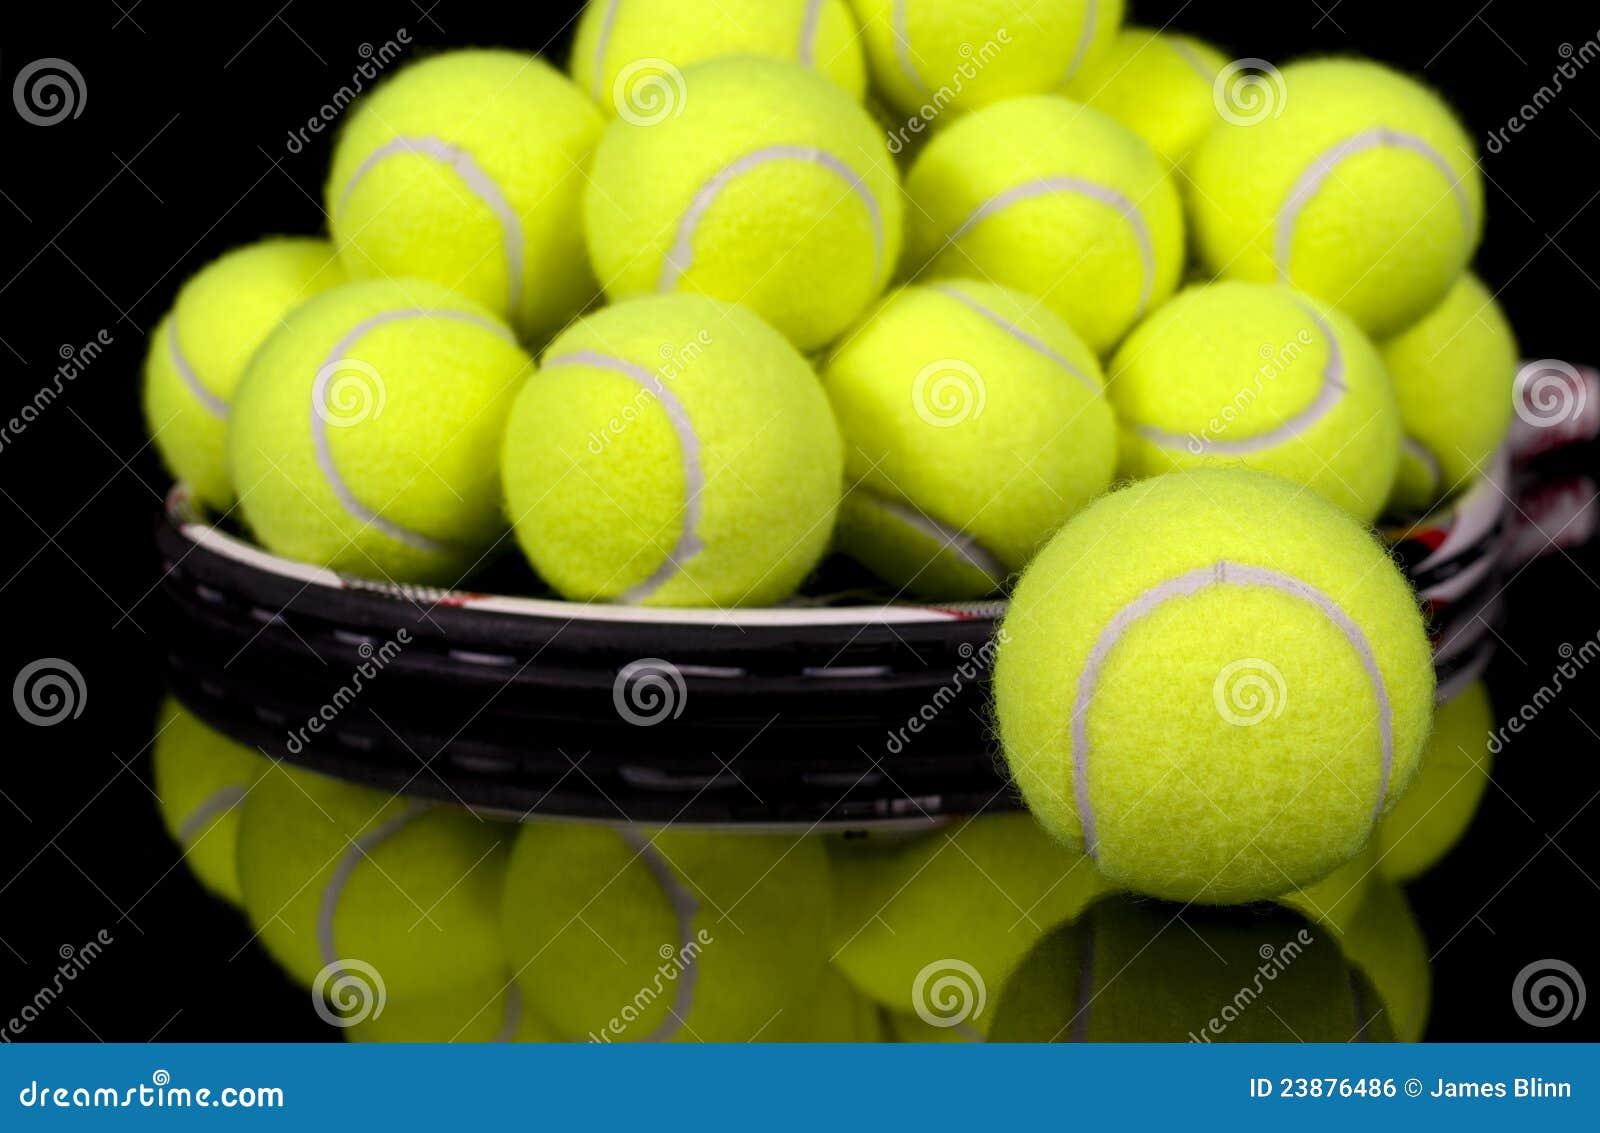 Tennis balls collected on tennis racket